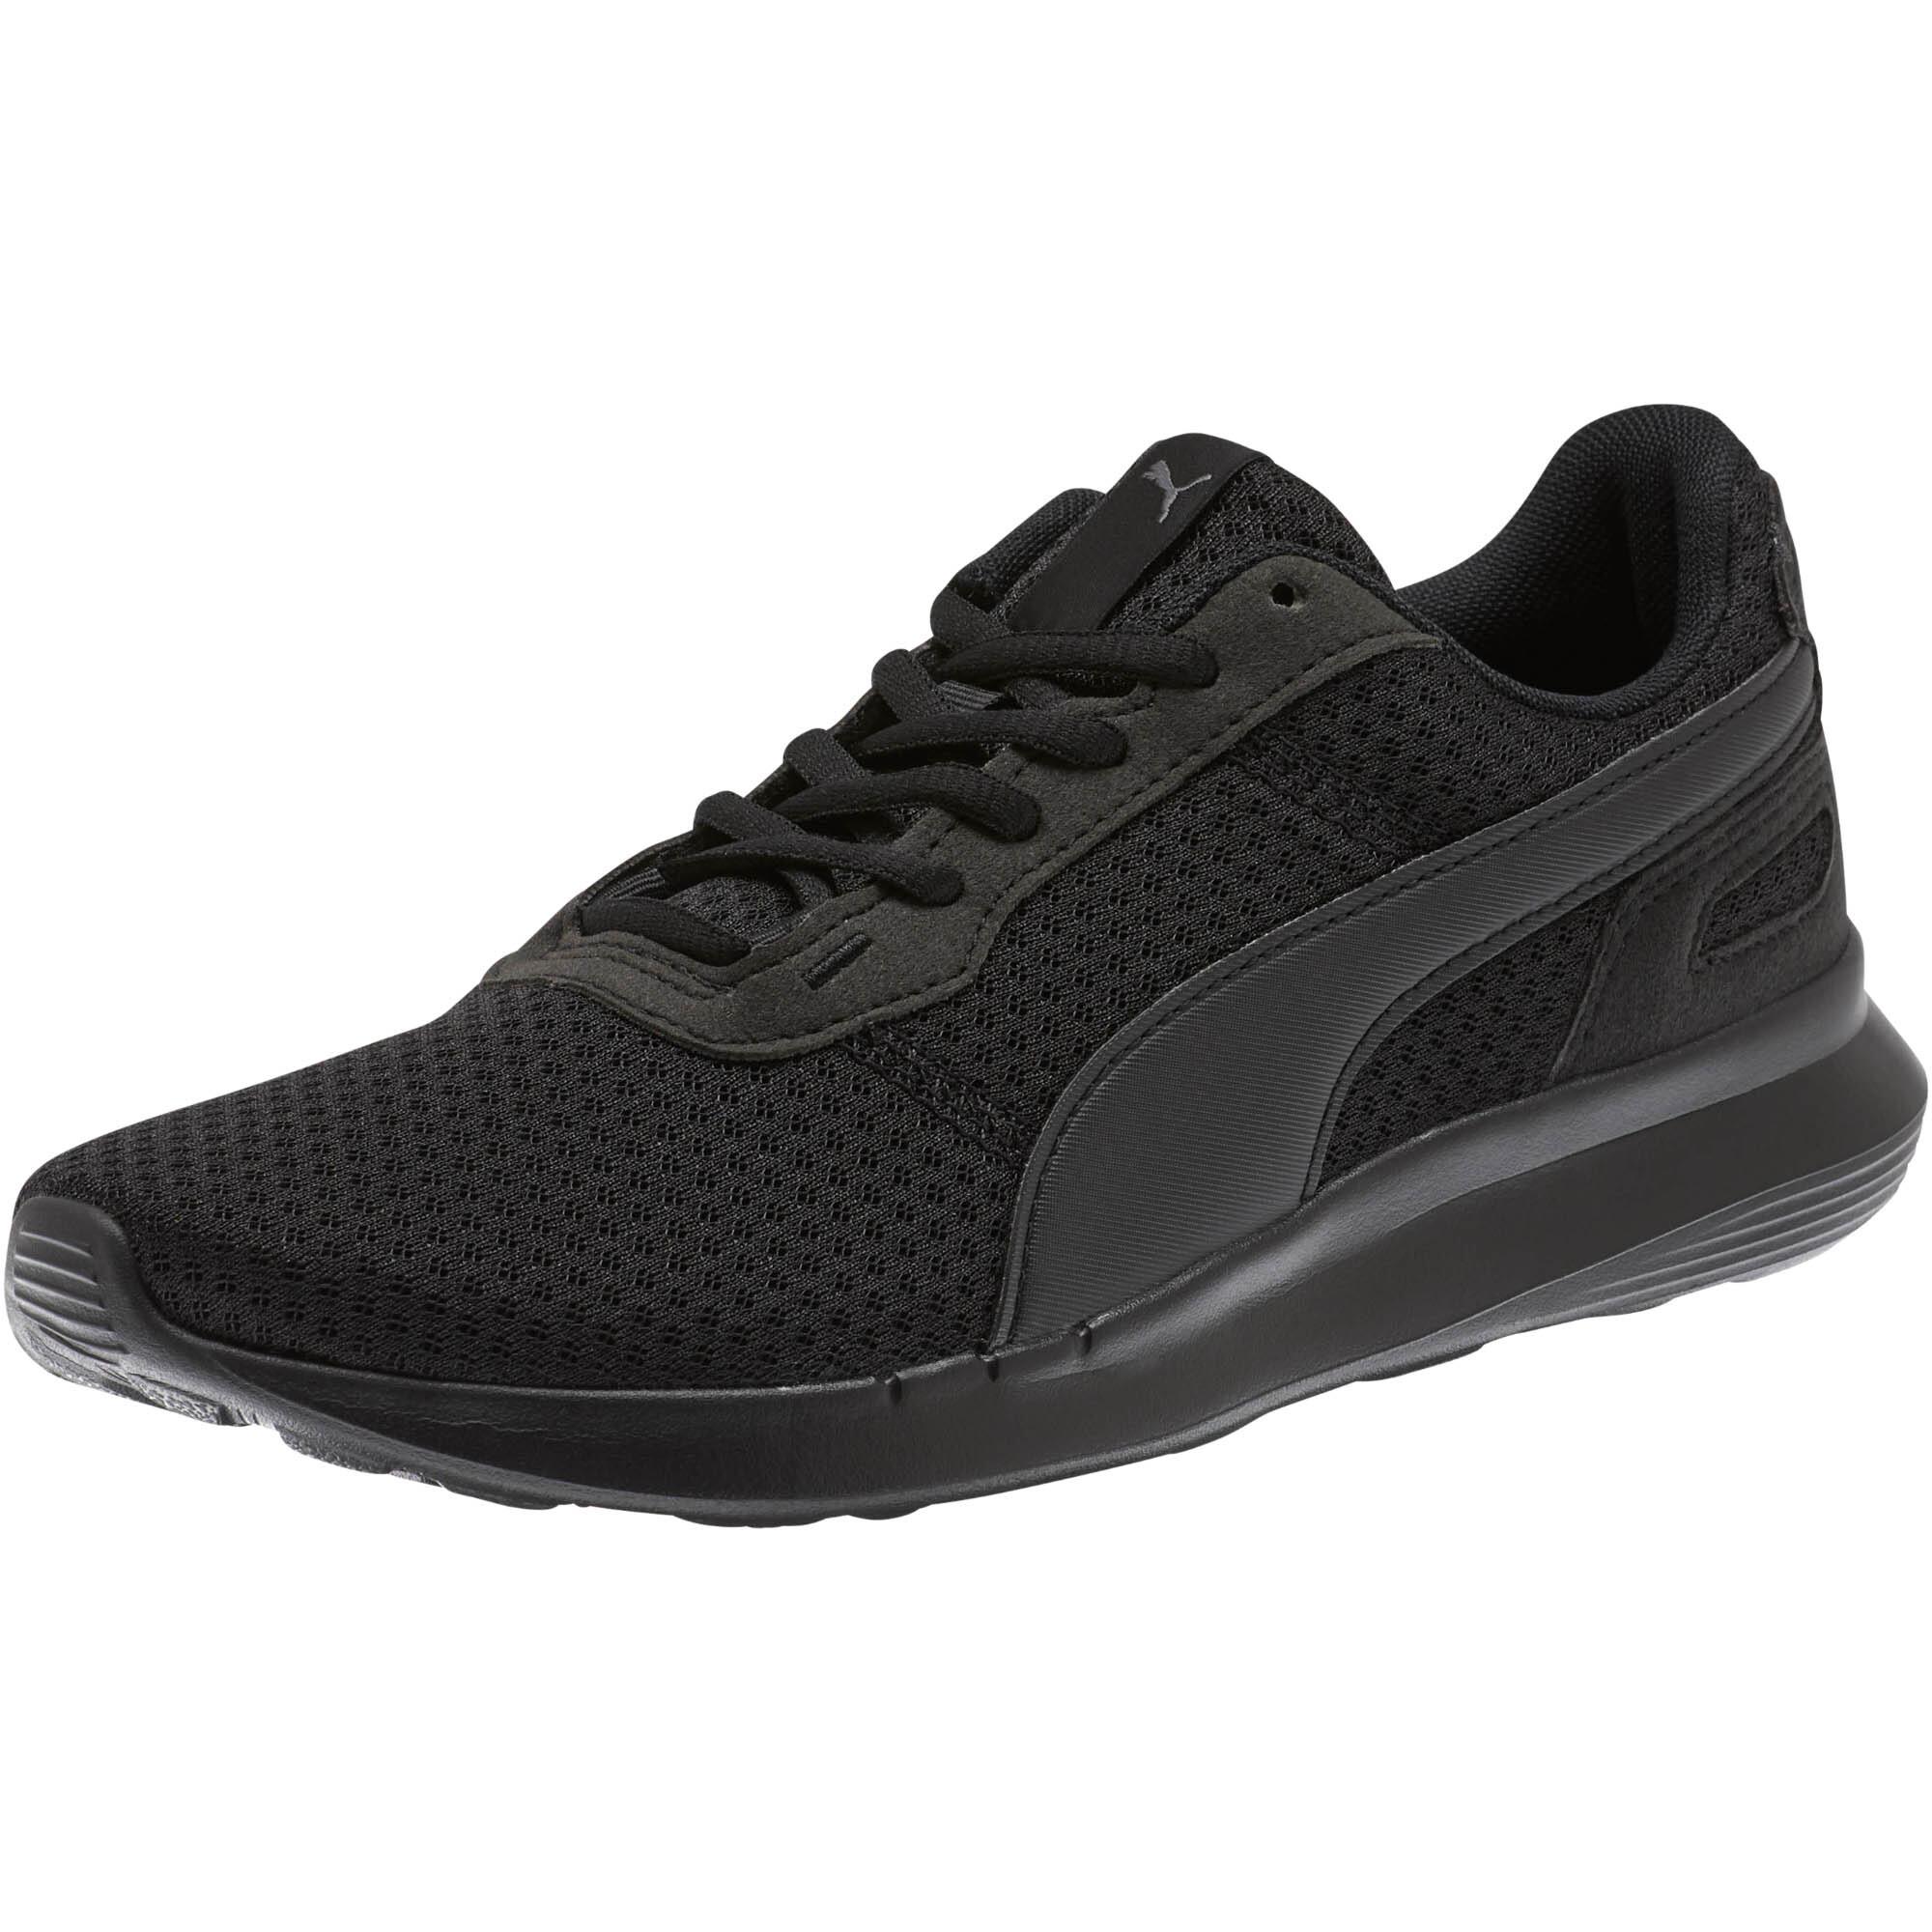 PUMA-ST-Activate-Women-s-Sneakers-Women-Shoe-Basics thumbnail 4